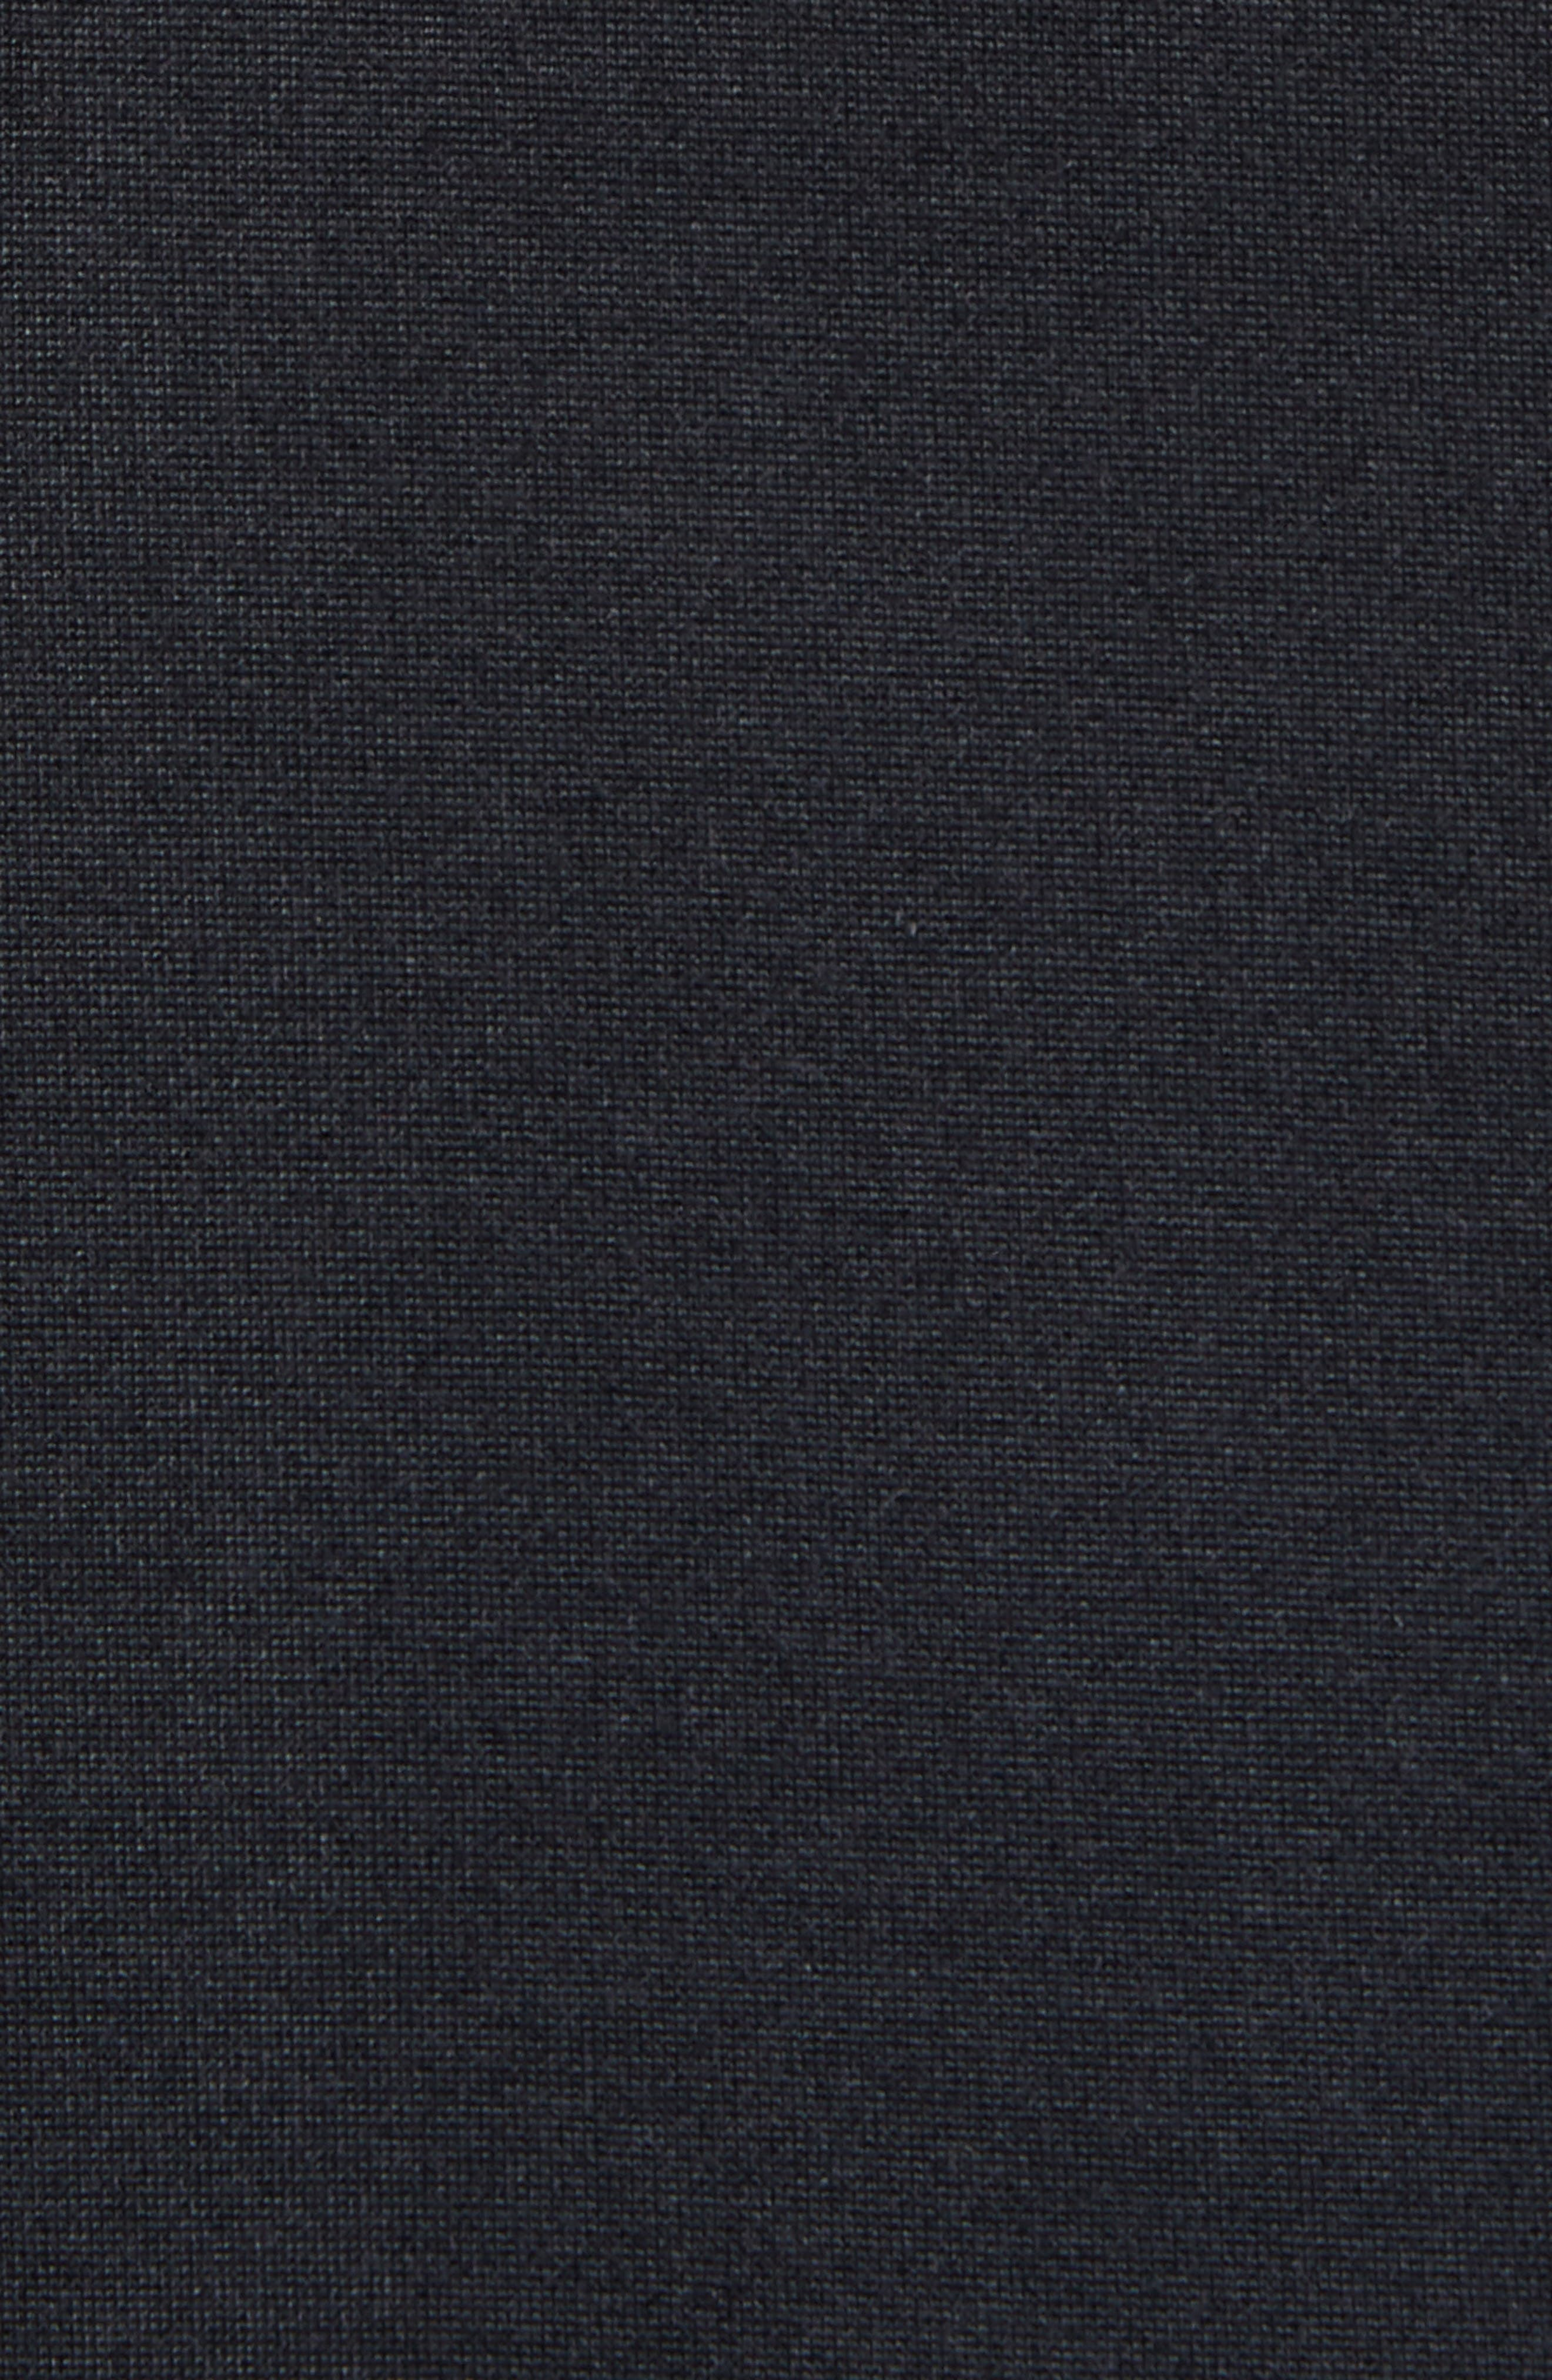 Nike Air Jordon Short Sleeve Basketball Hoodie,                             Alternate thumbnail 5, color,                             BLACK/ WHITE